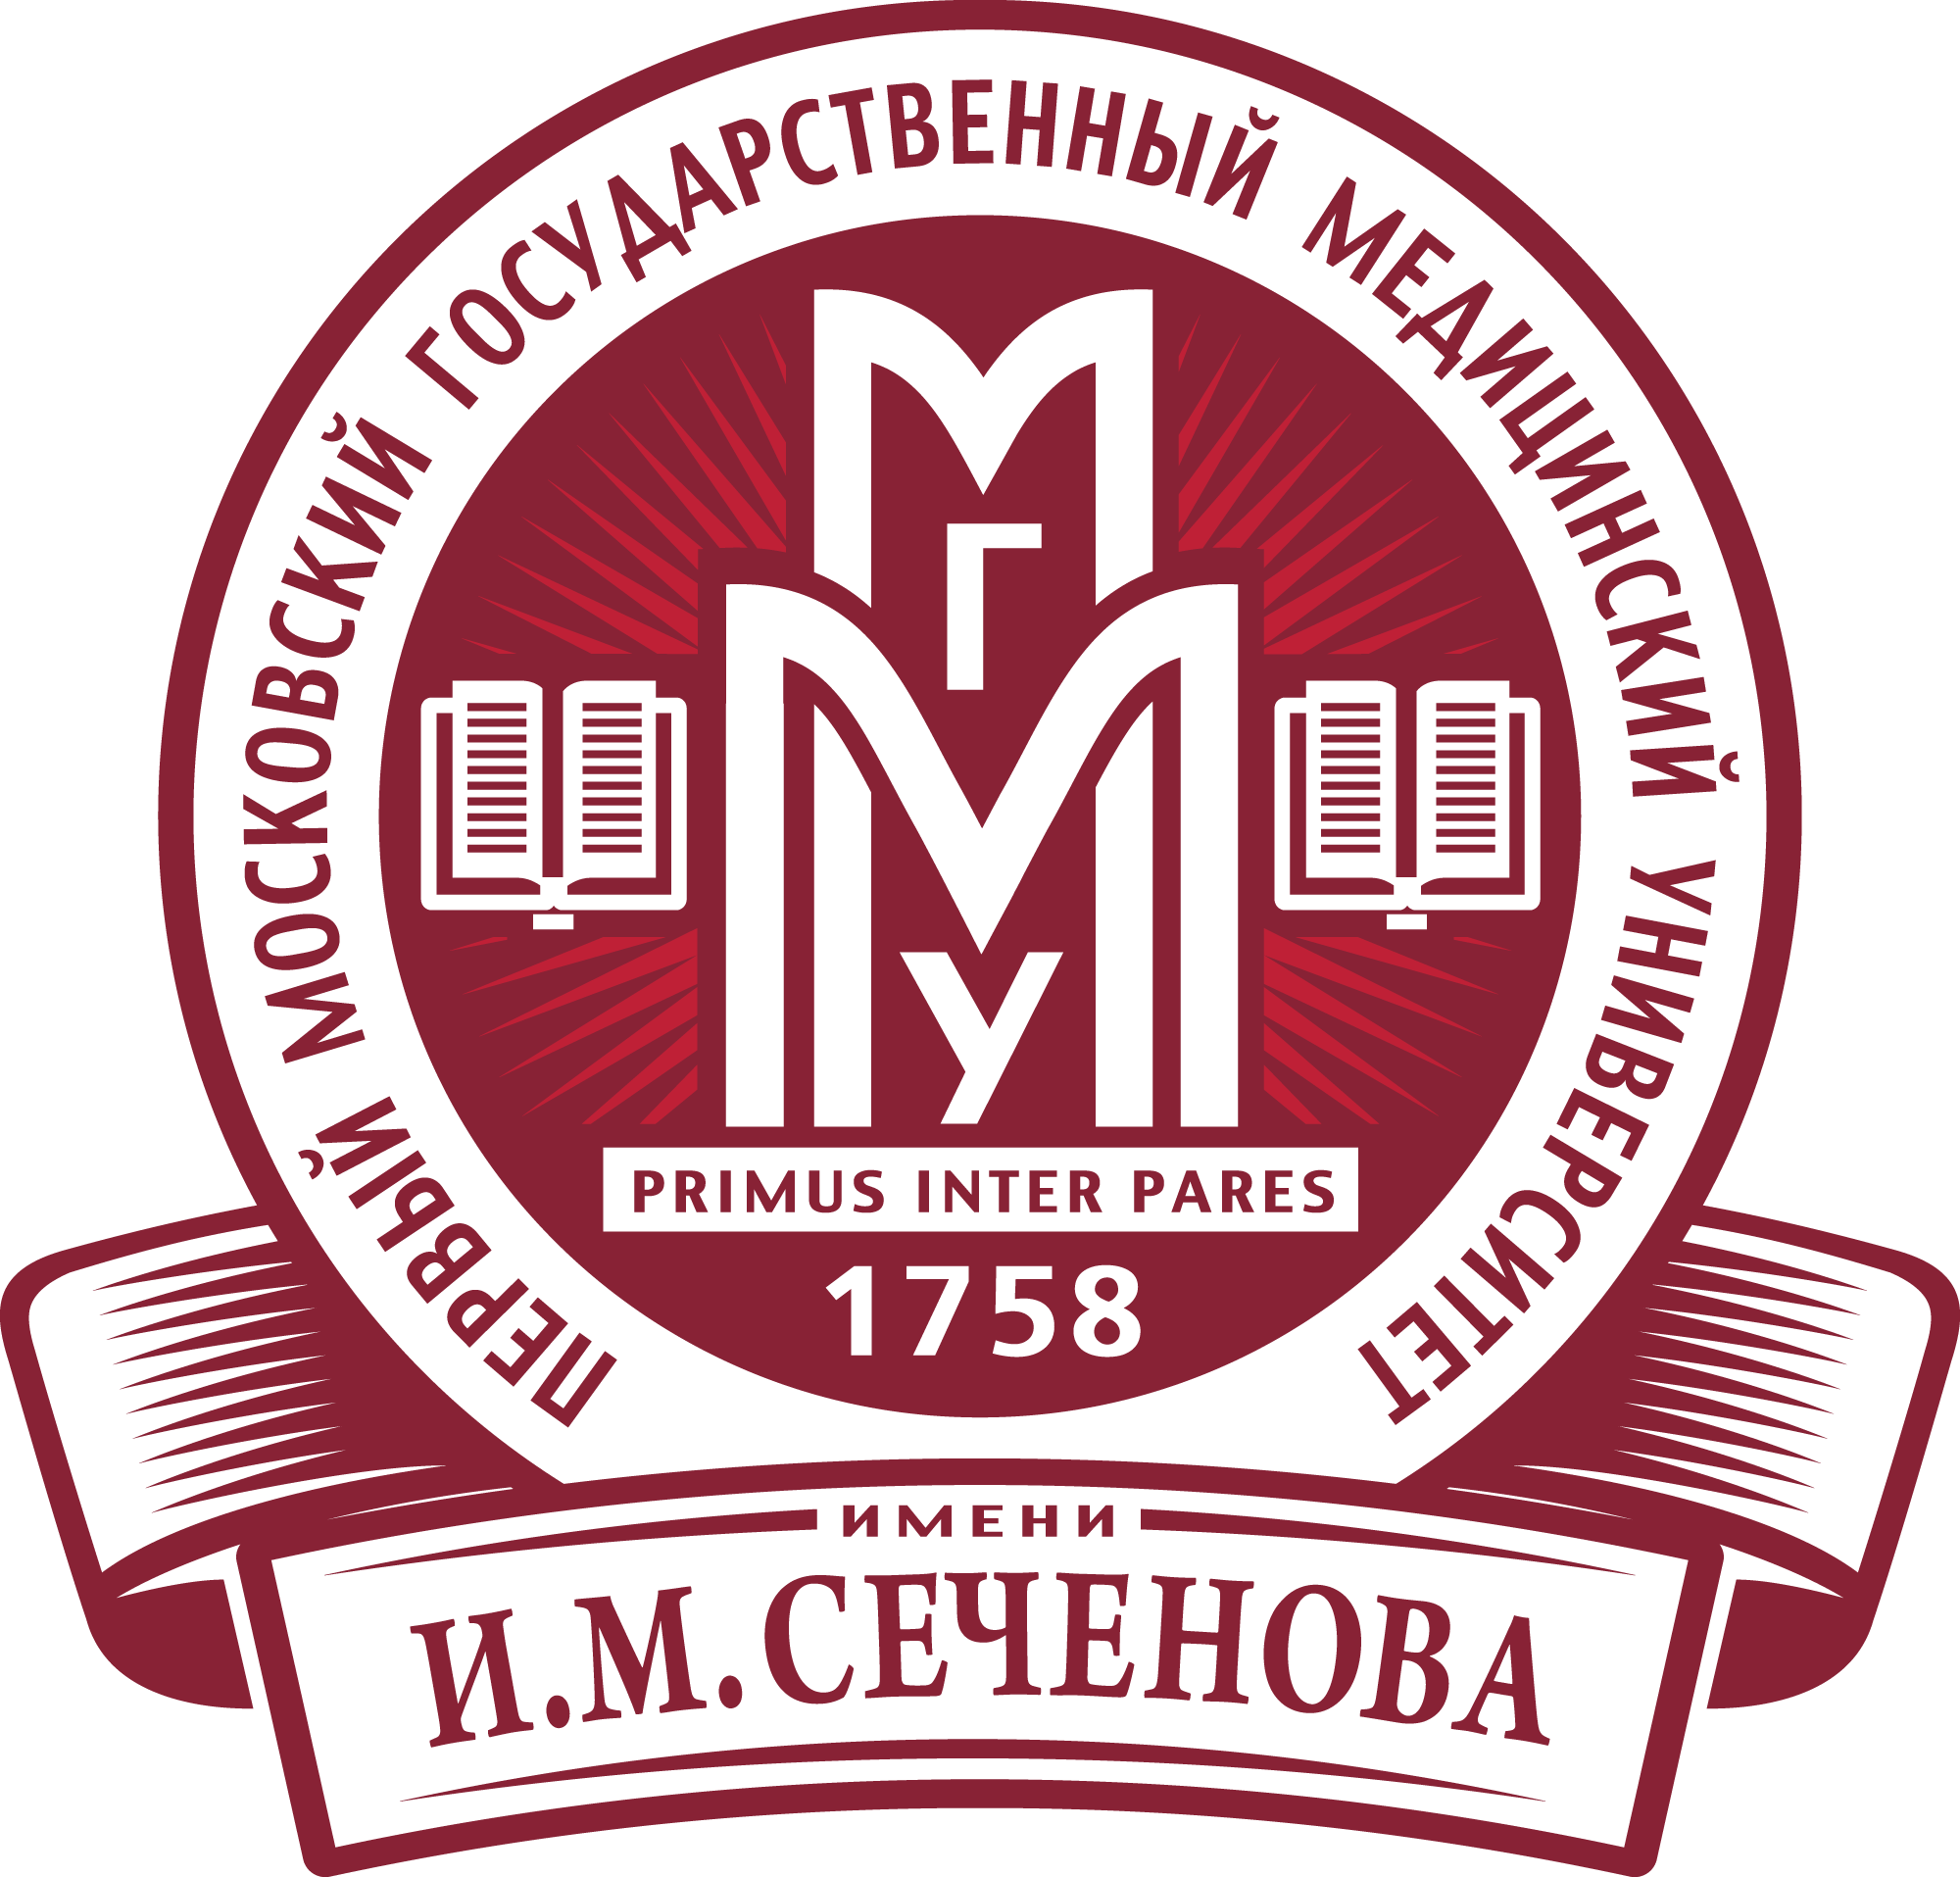 сеченова логотип